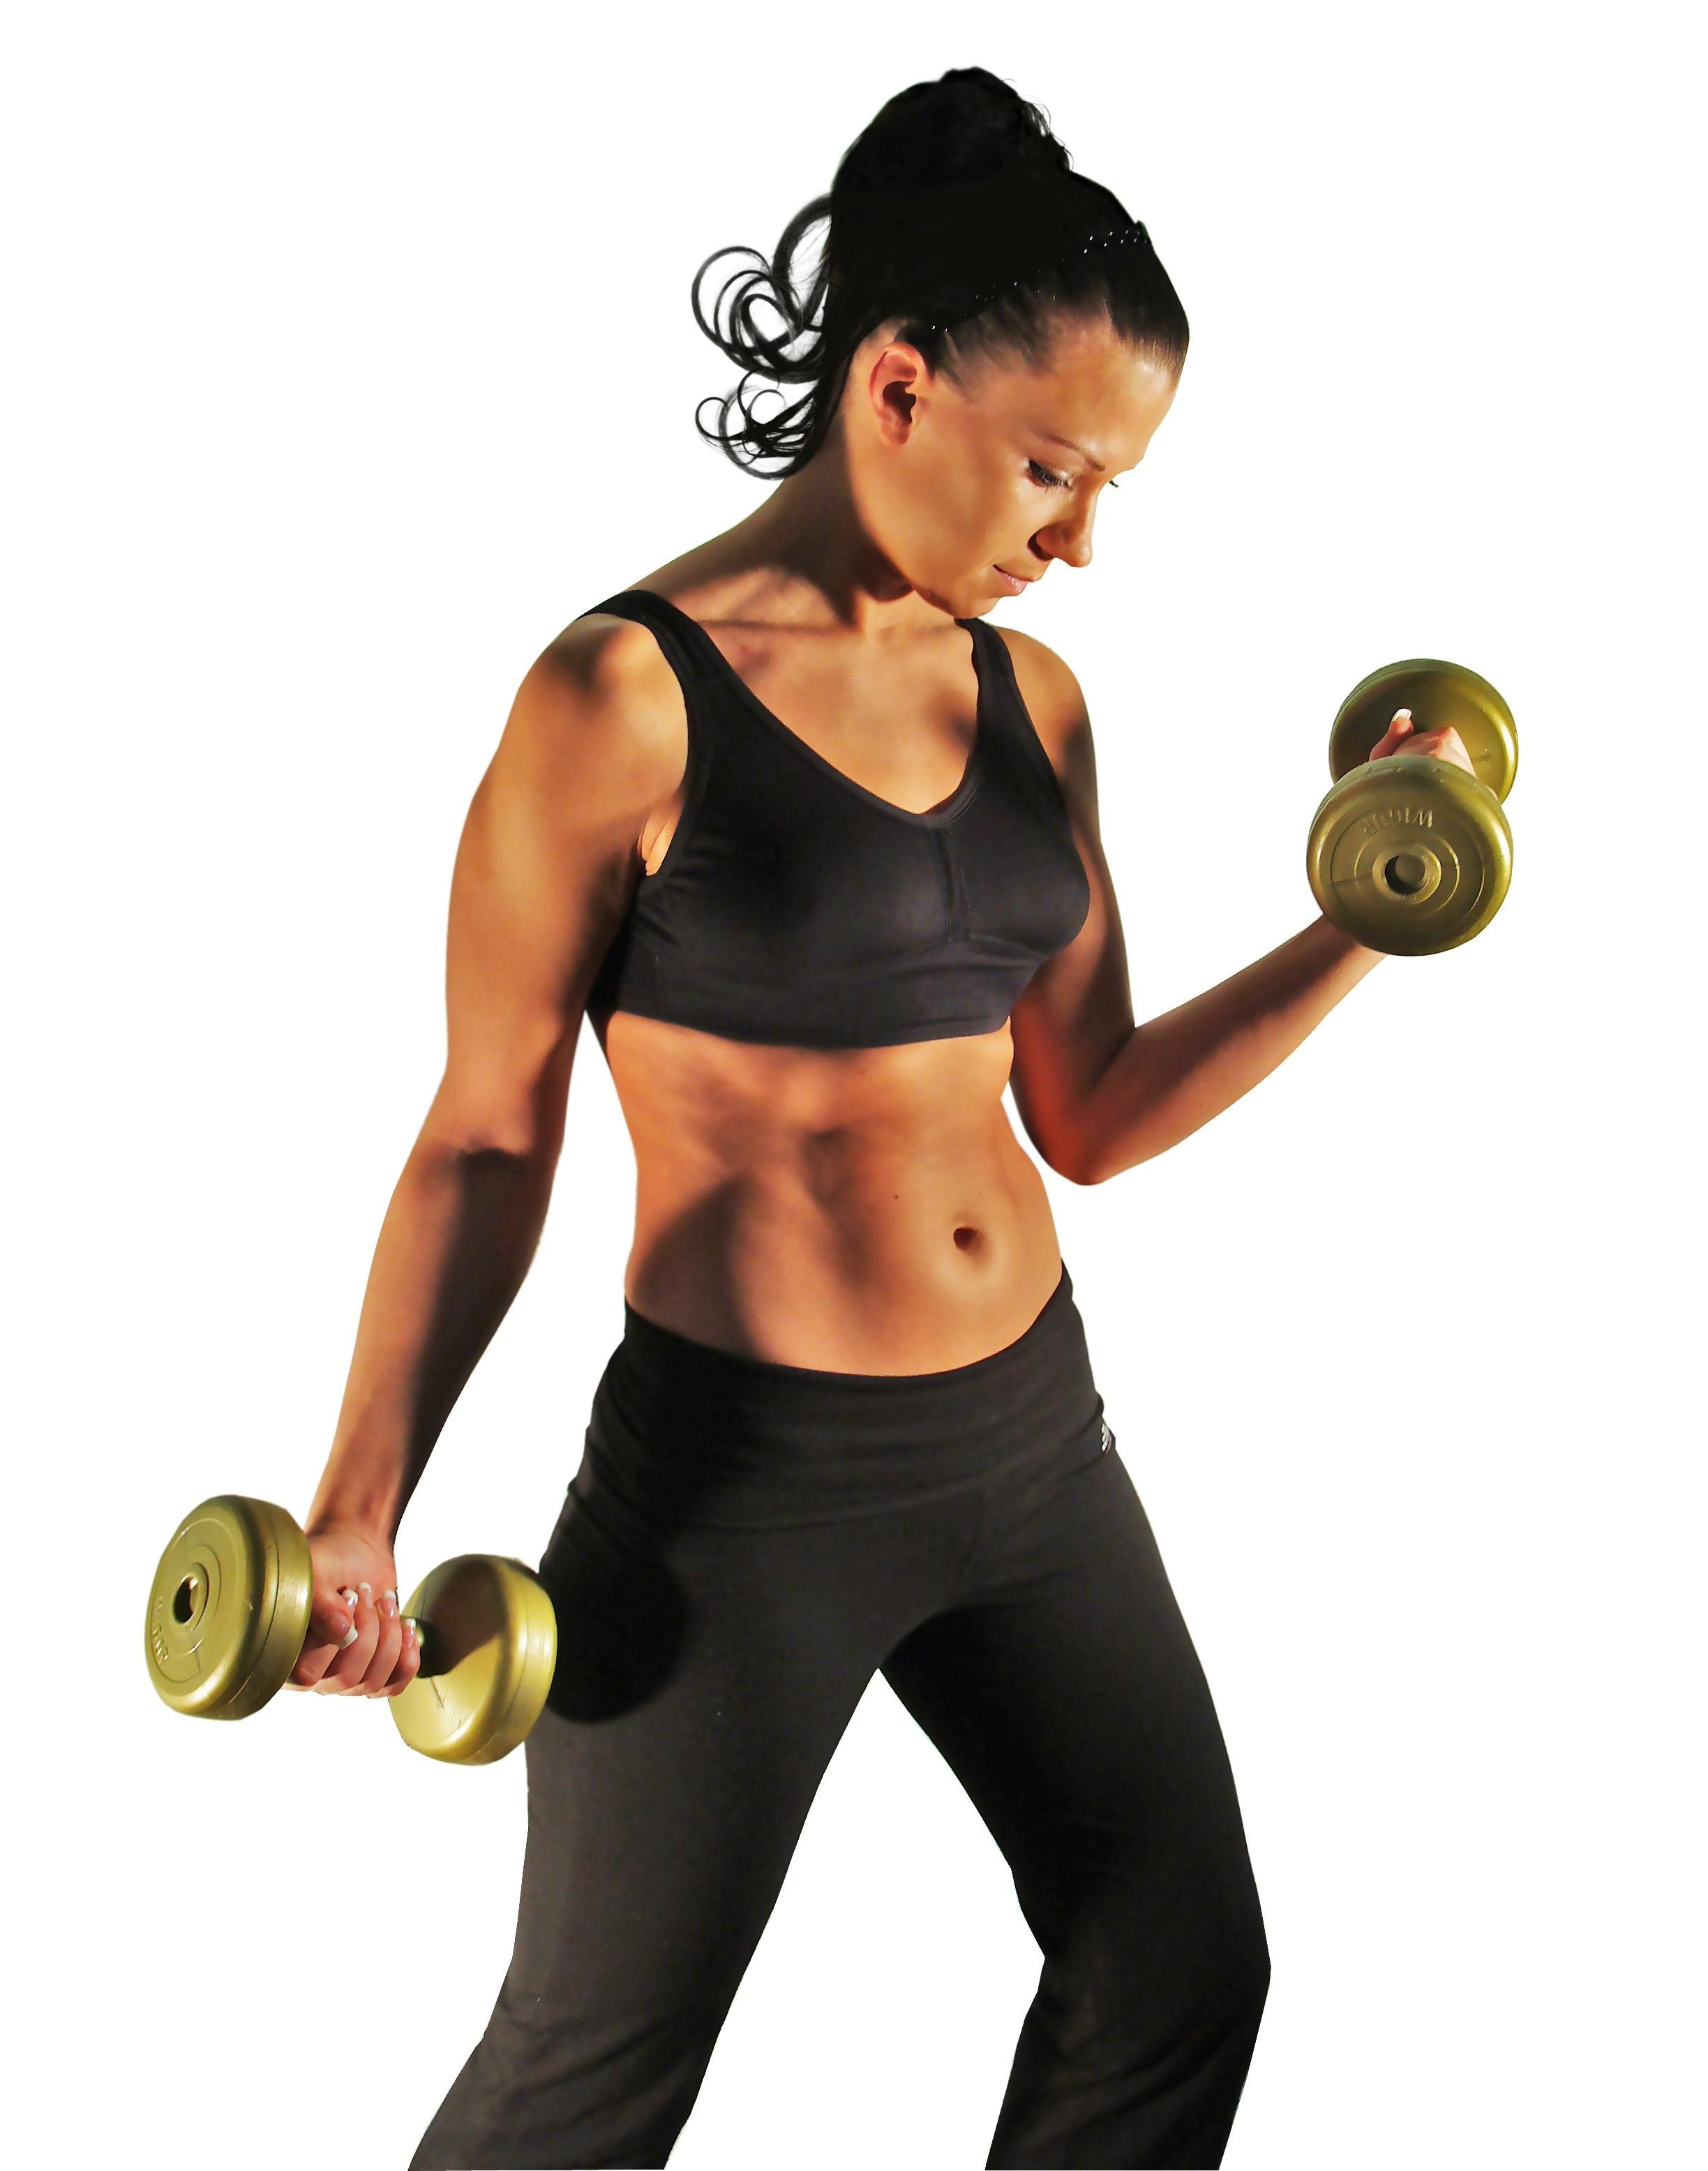 Las mujeres al levantar pesas ganan mucha masa muscular.